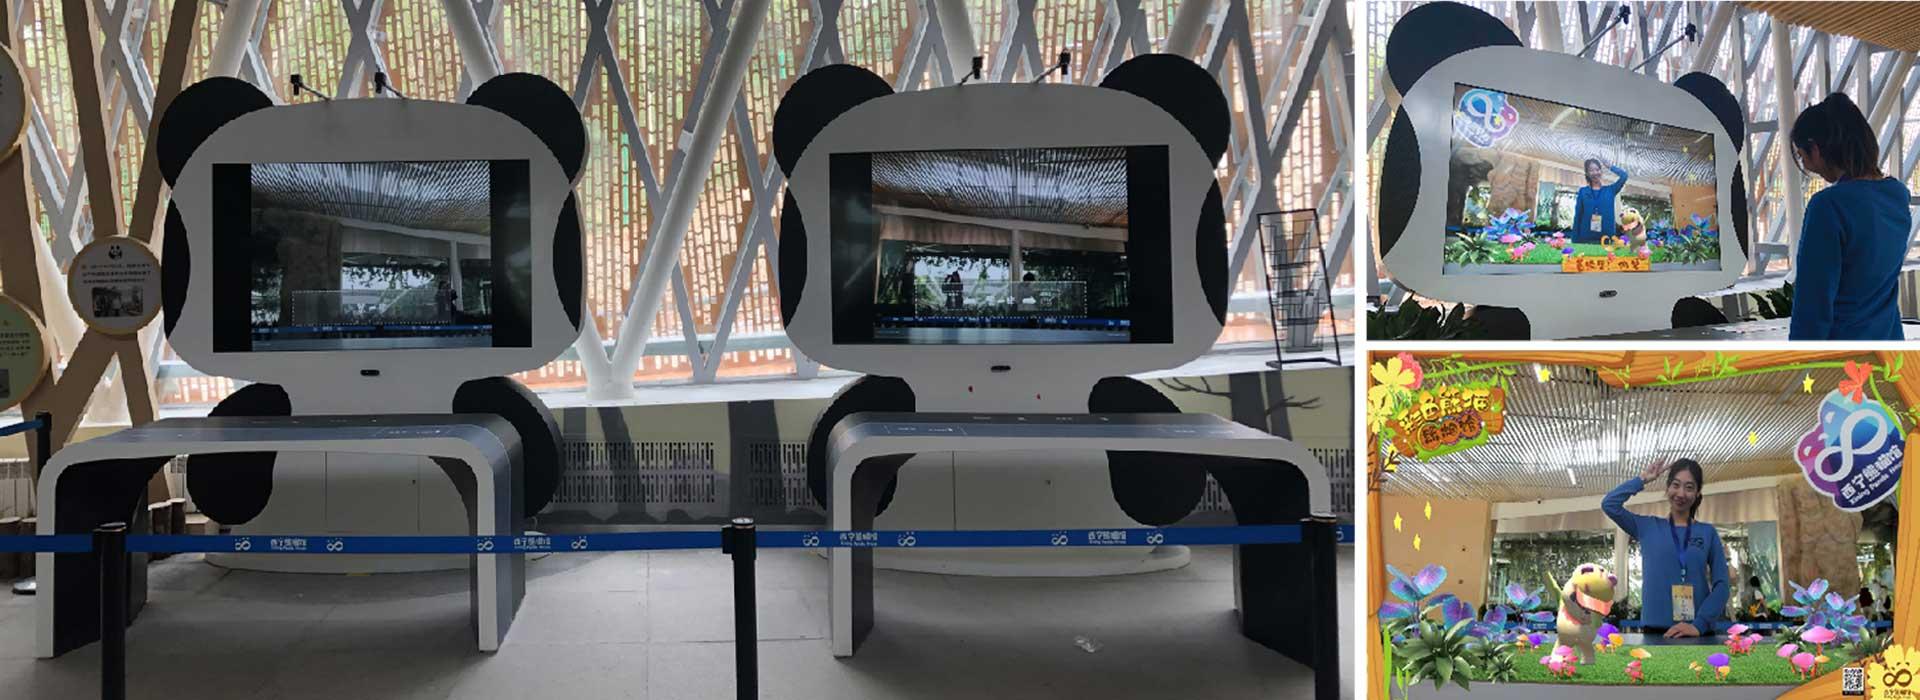 3D-Animation-PandaHouse-PhotoStudio-2